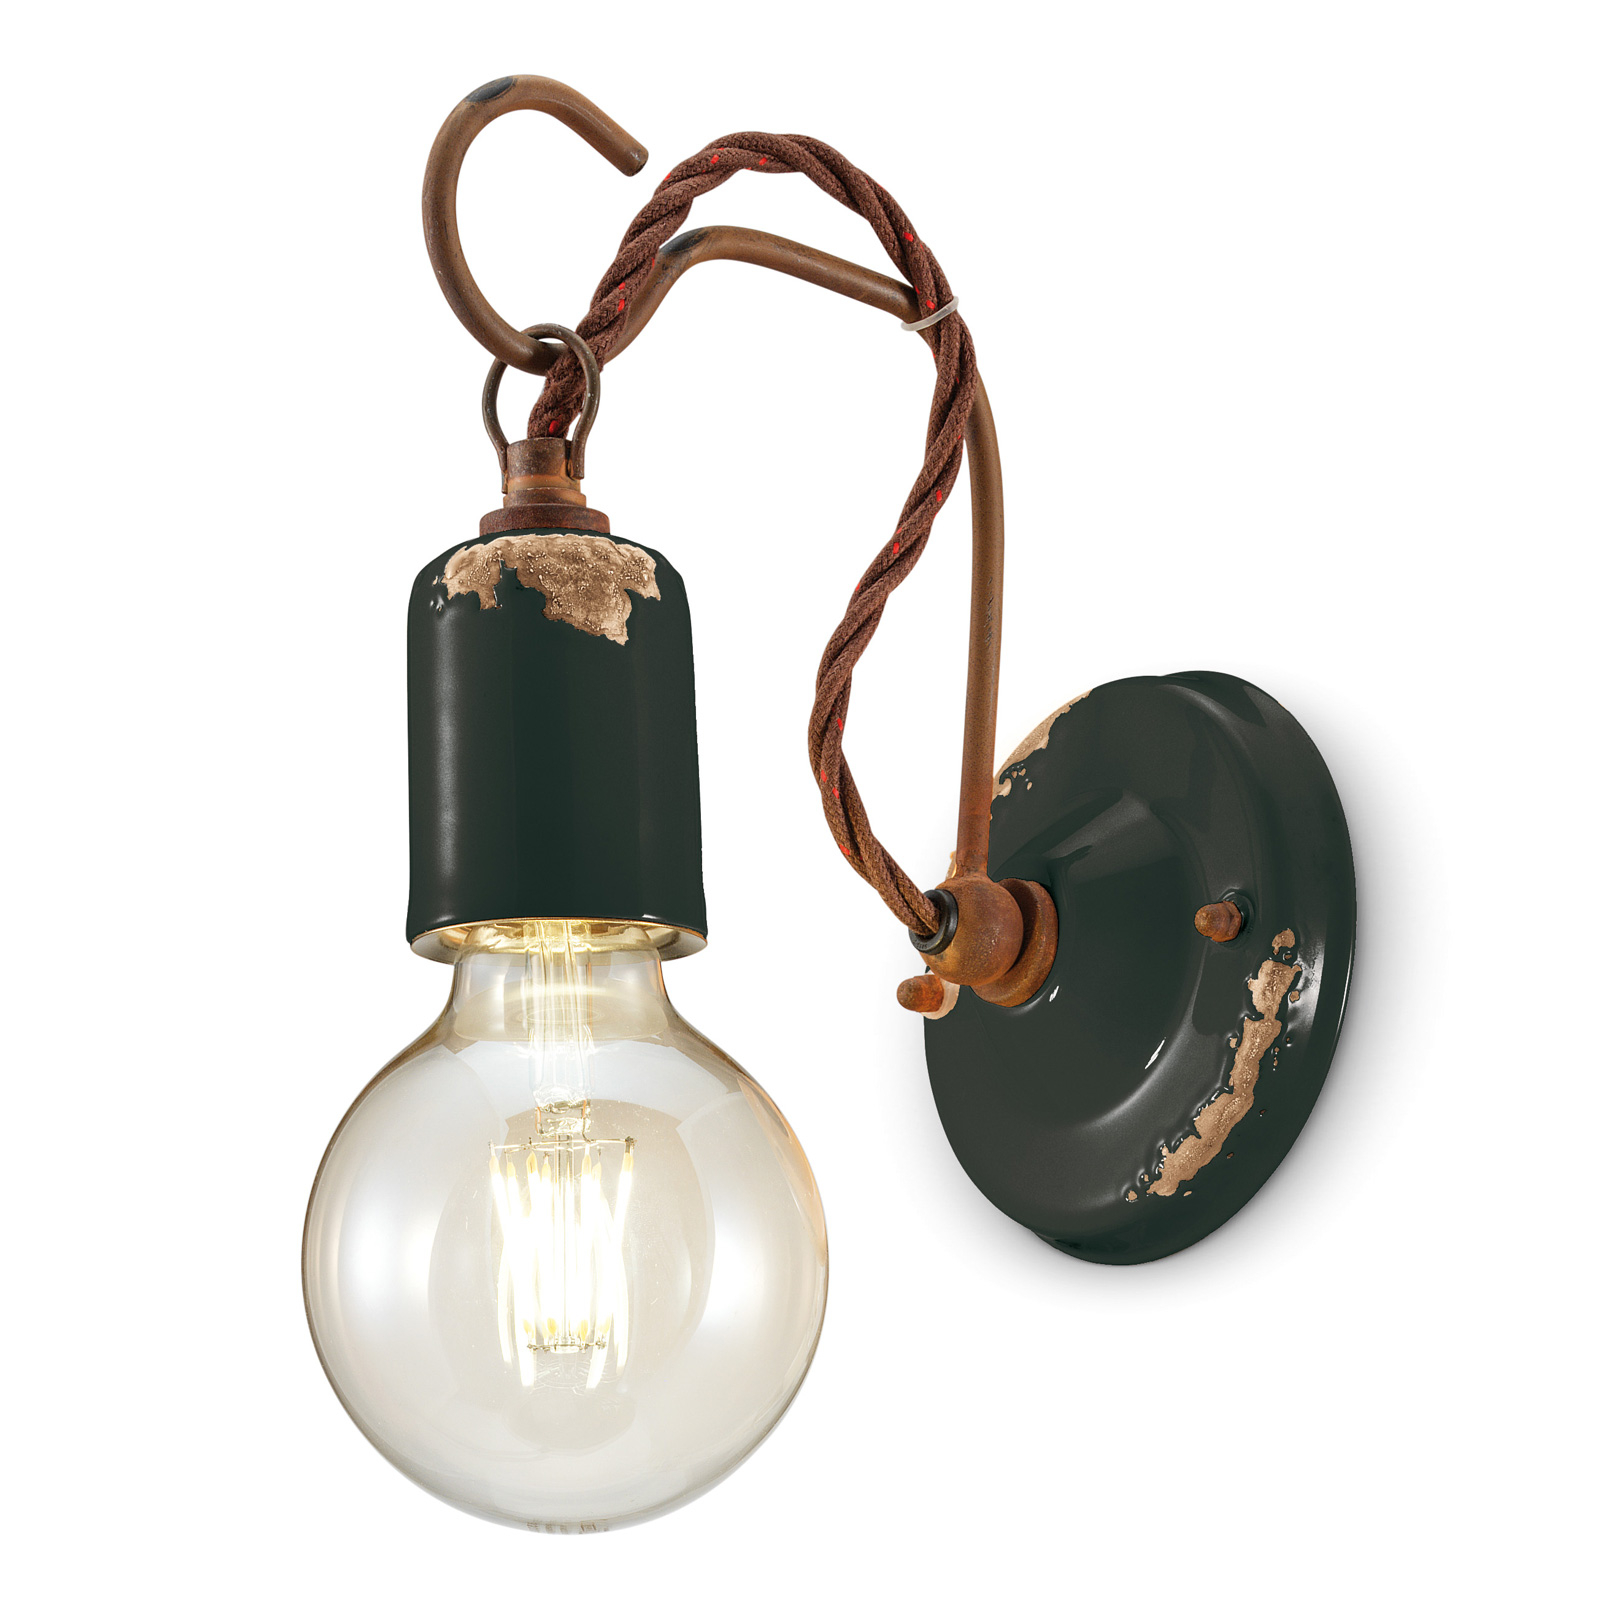 Wandlamp C665 in vintage-stijl zwart